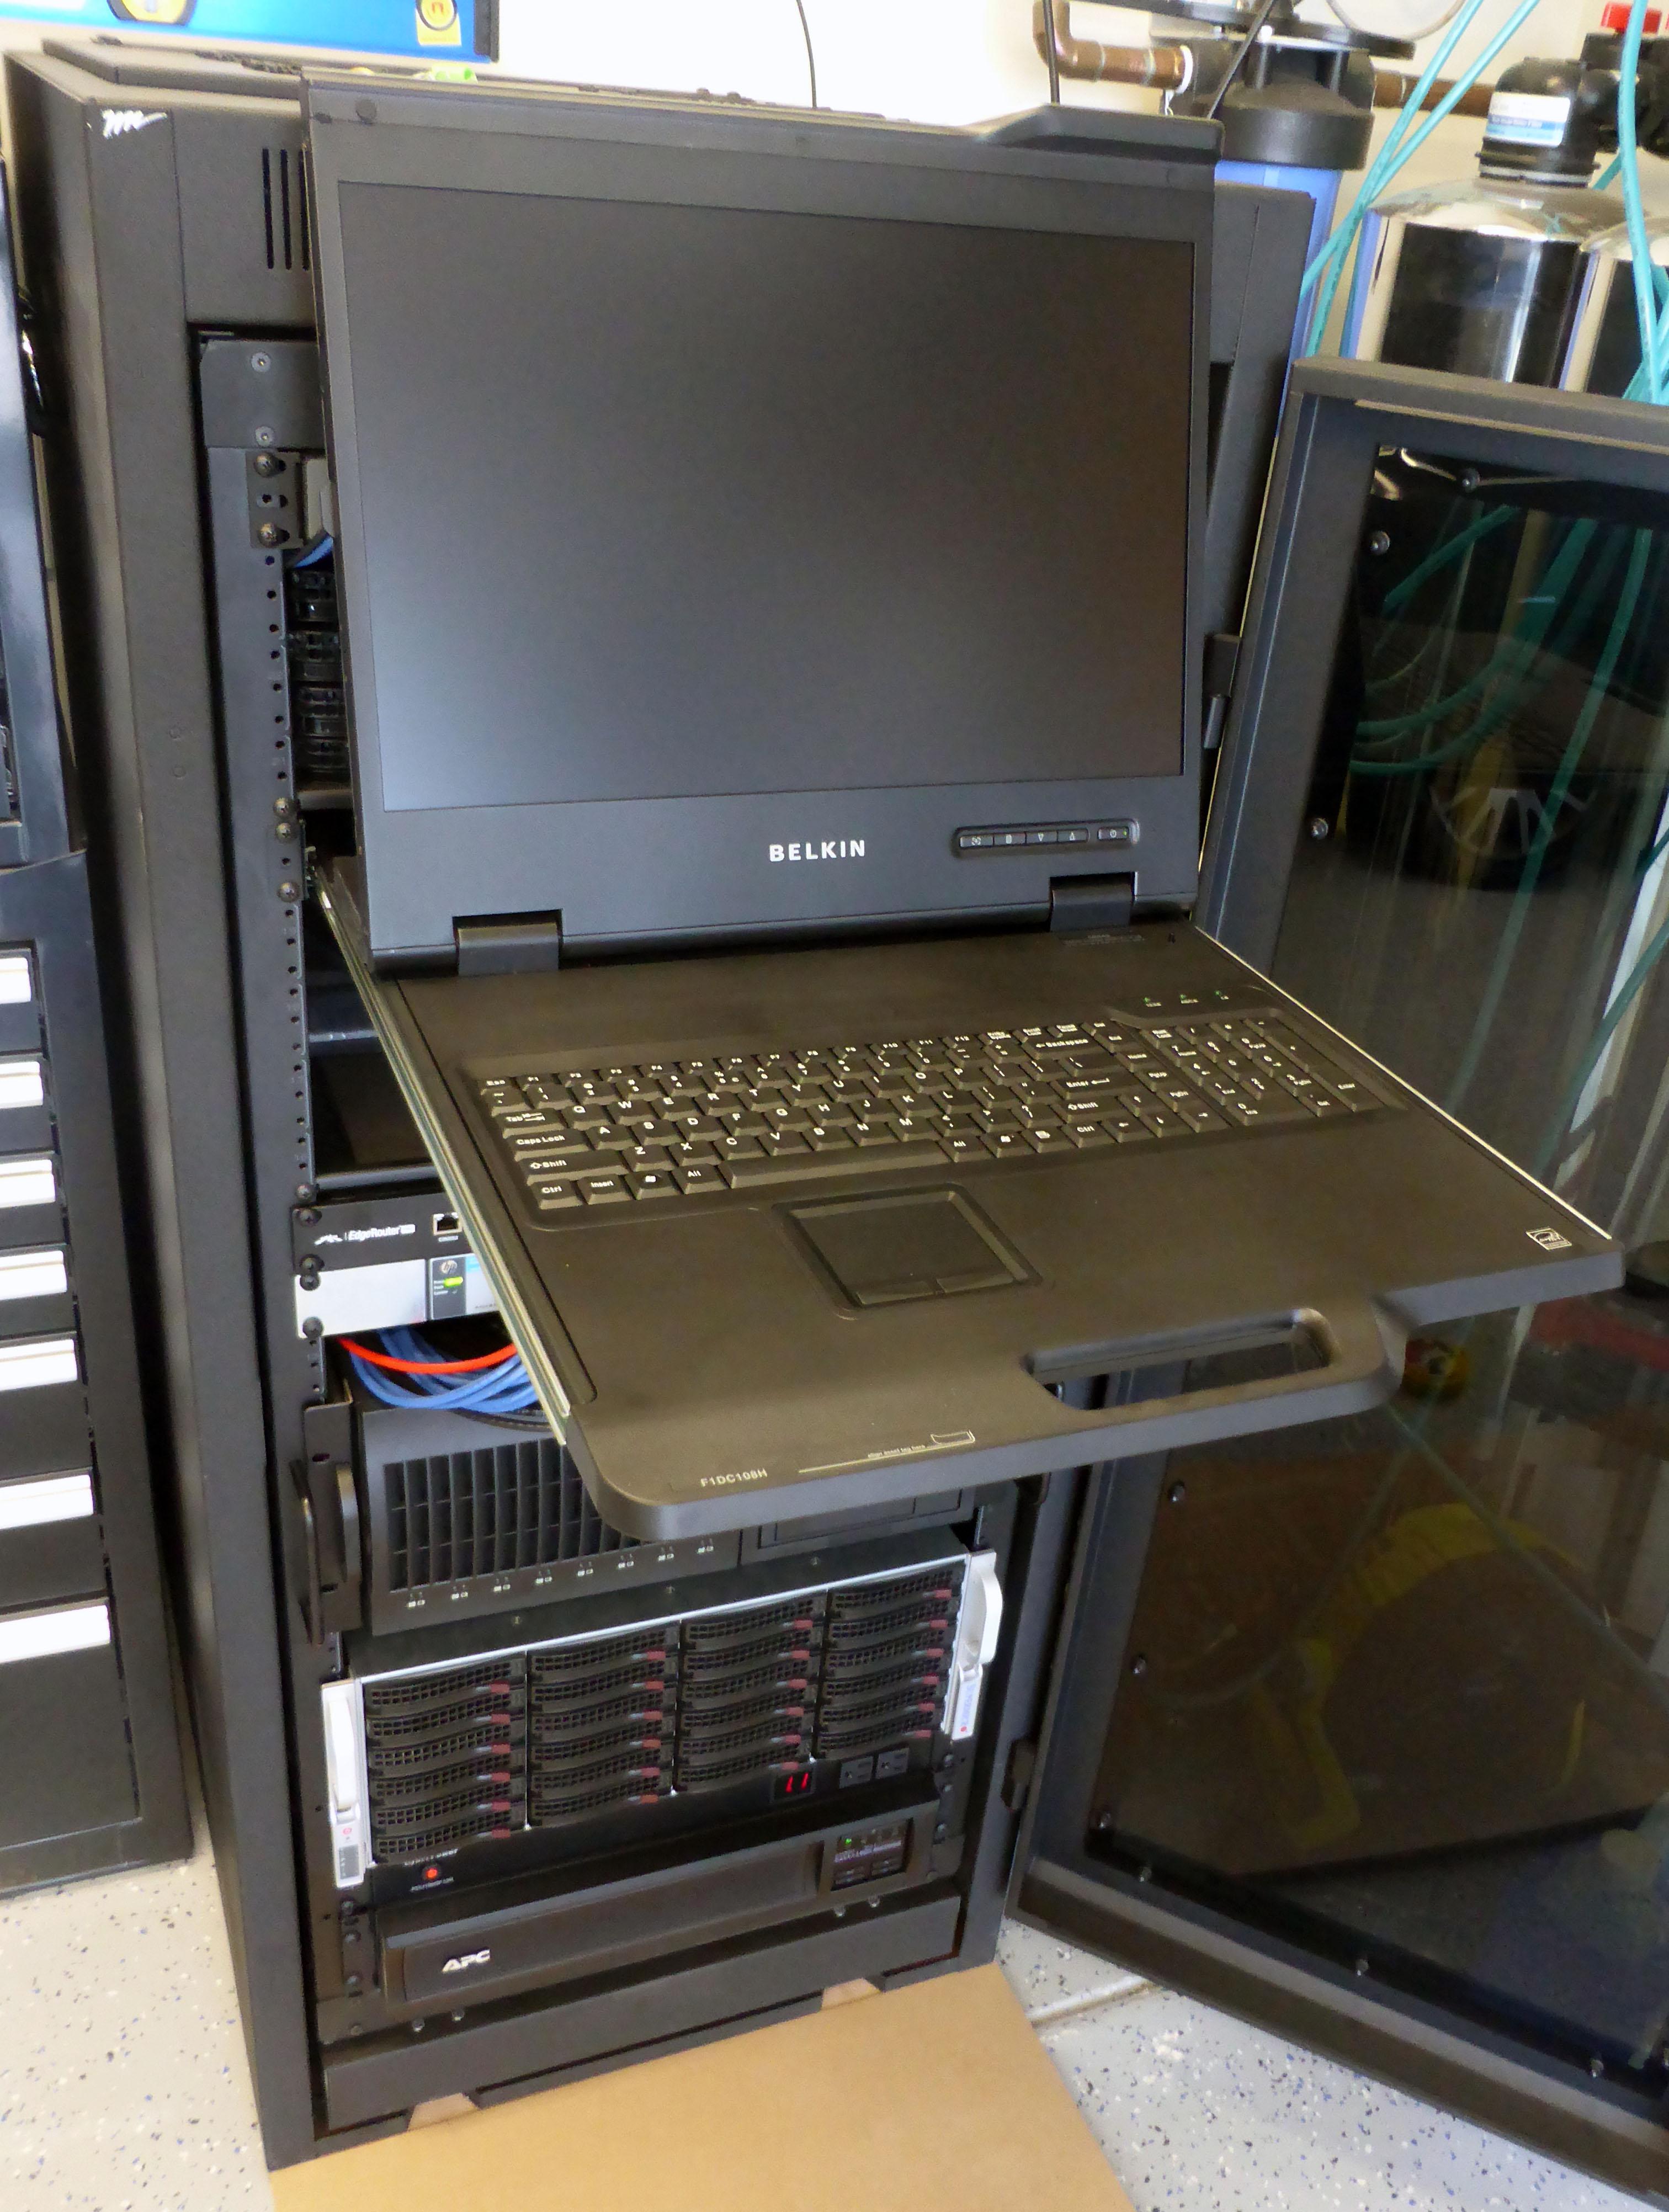 Kvm Kvm Physical Disk Access